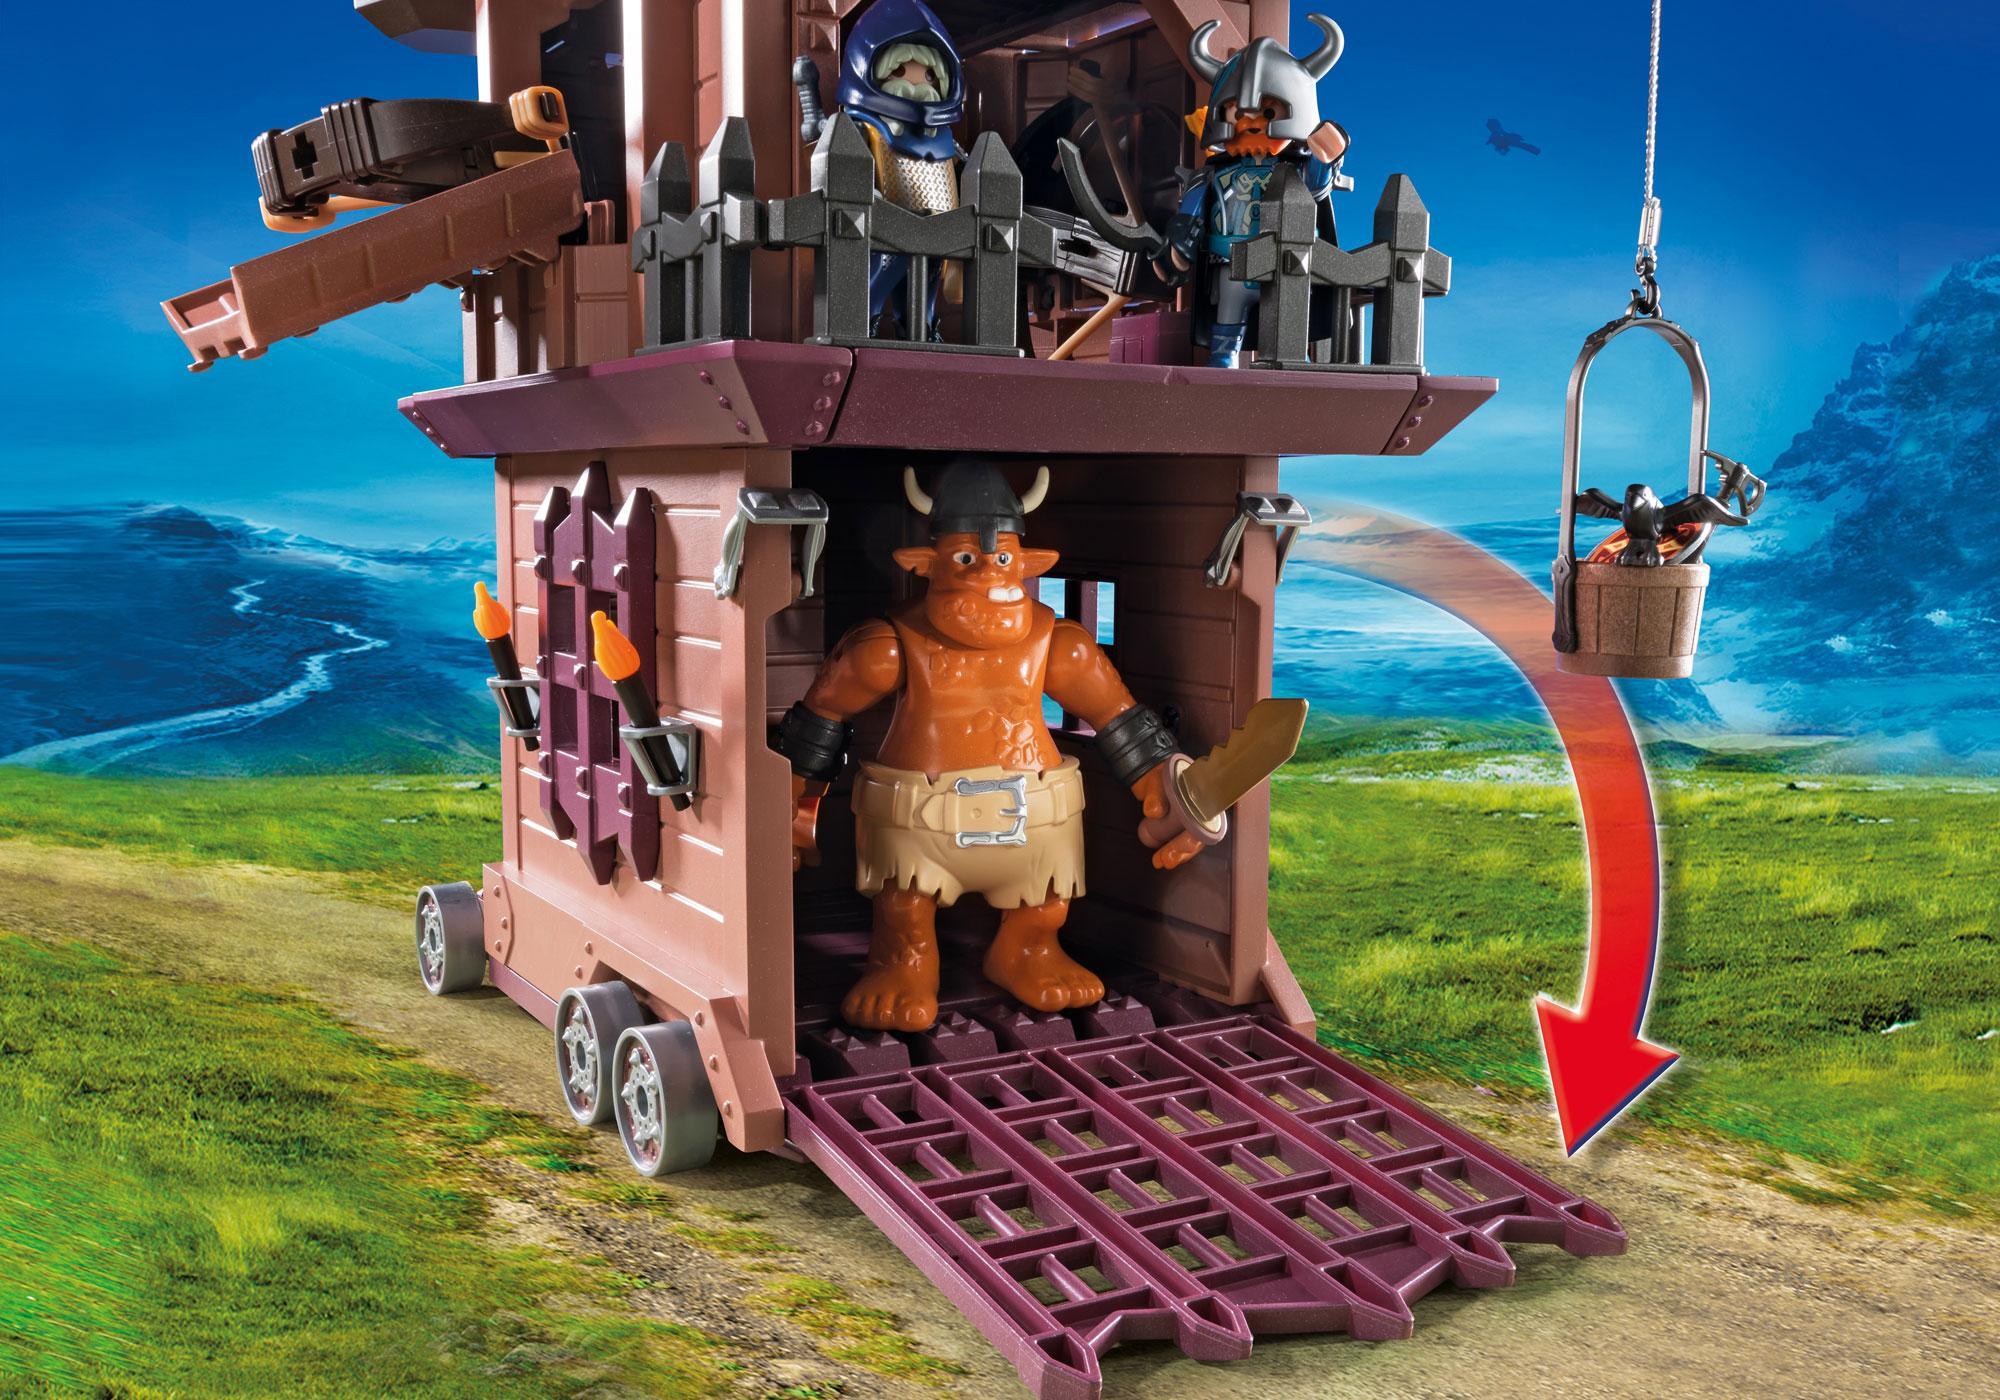 http://media.playmobil.com/i/playmobil/9340_product_extra1/Mobile Dwarf Fortress